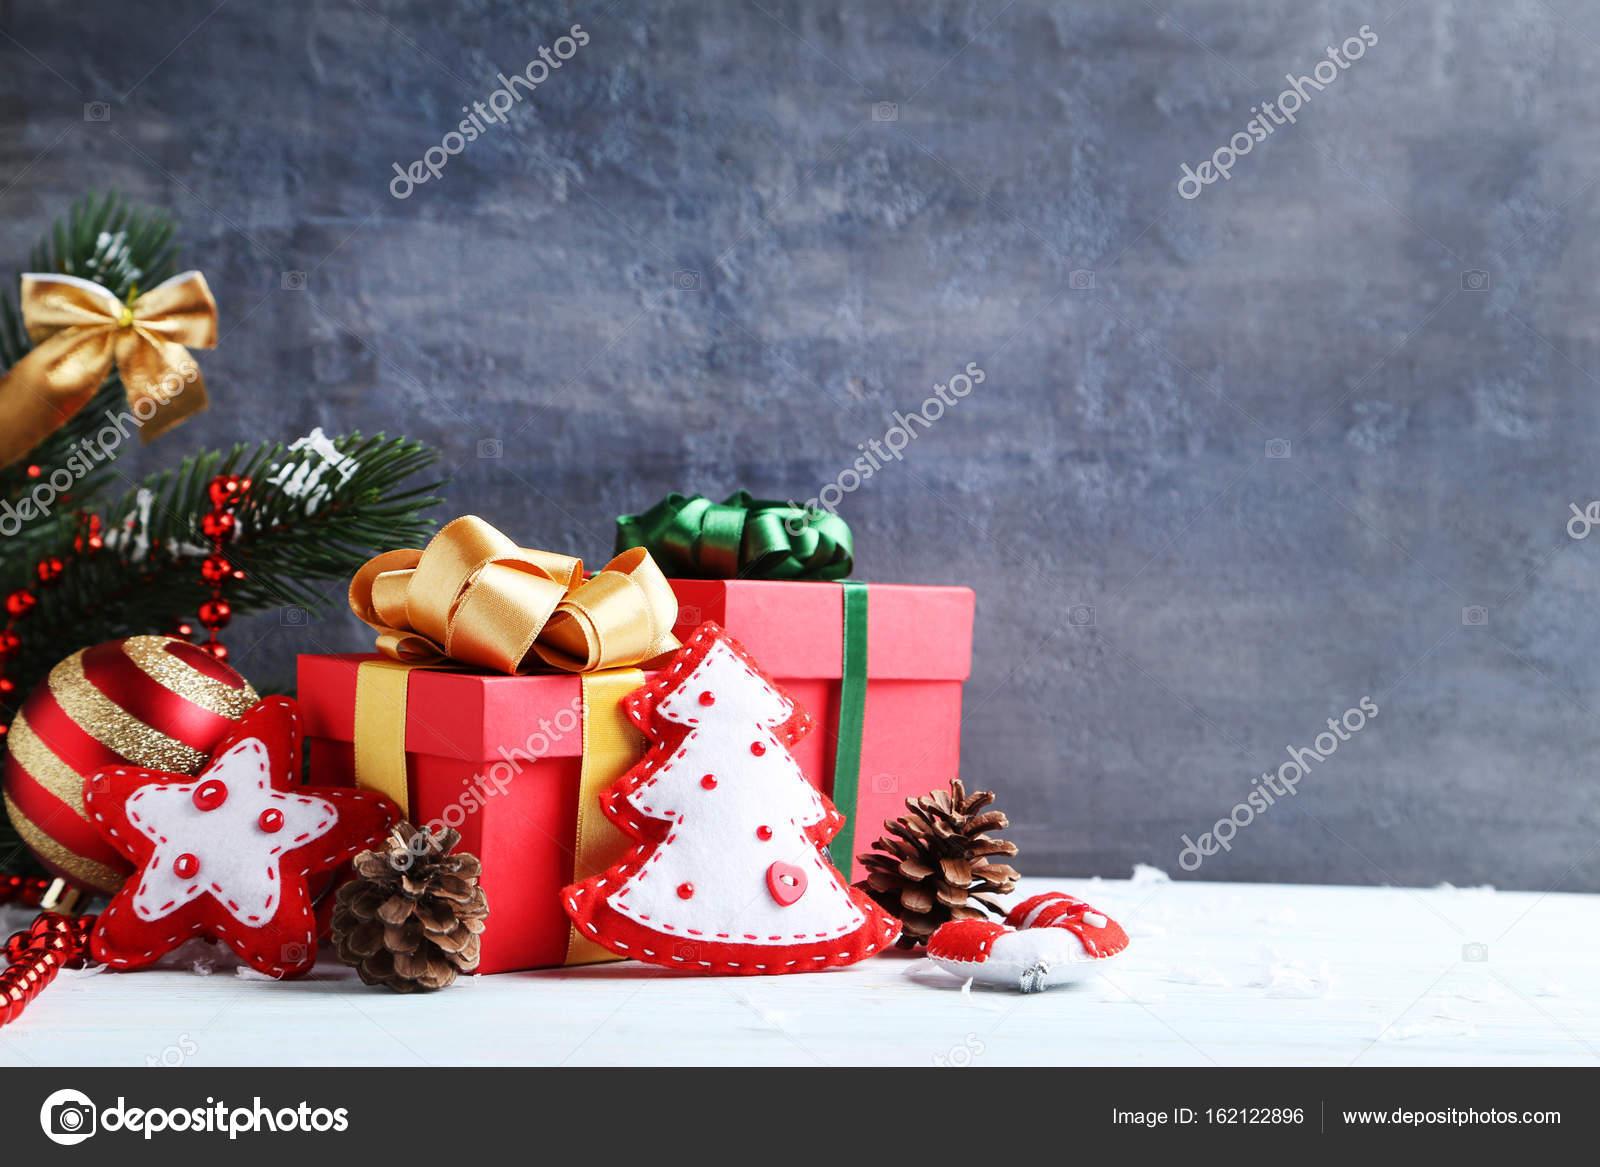 Decorazioni Luminose Natalizie : Decorazioni luminose natalizie u2014 foto stock © 5seconds #162122896